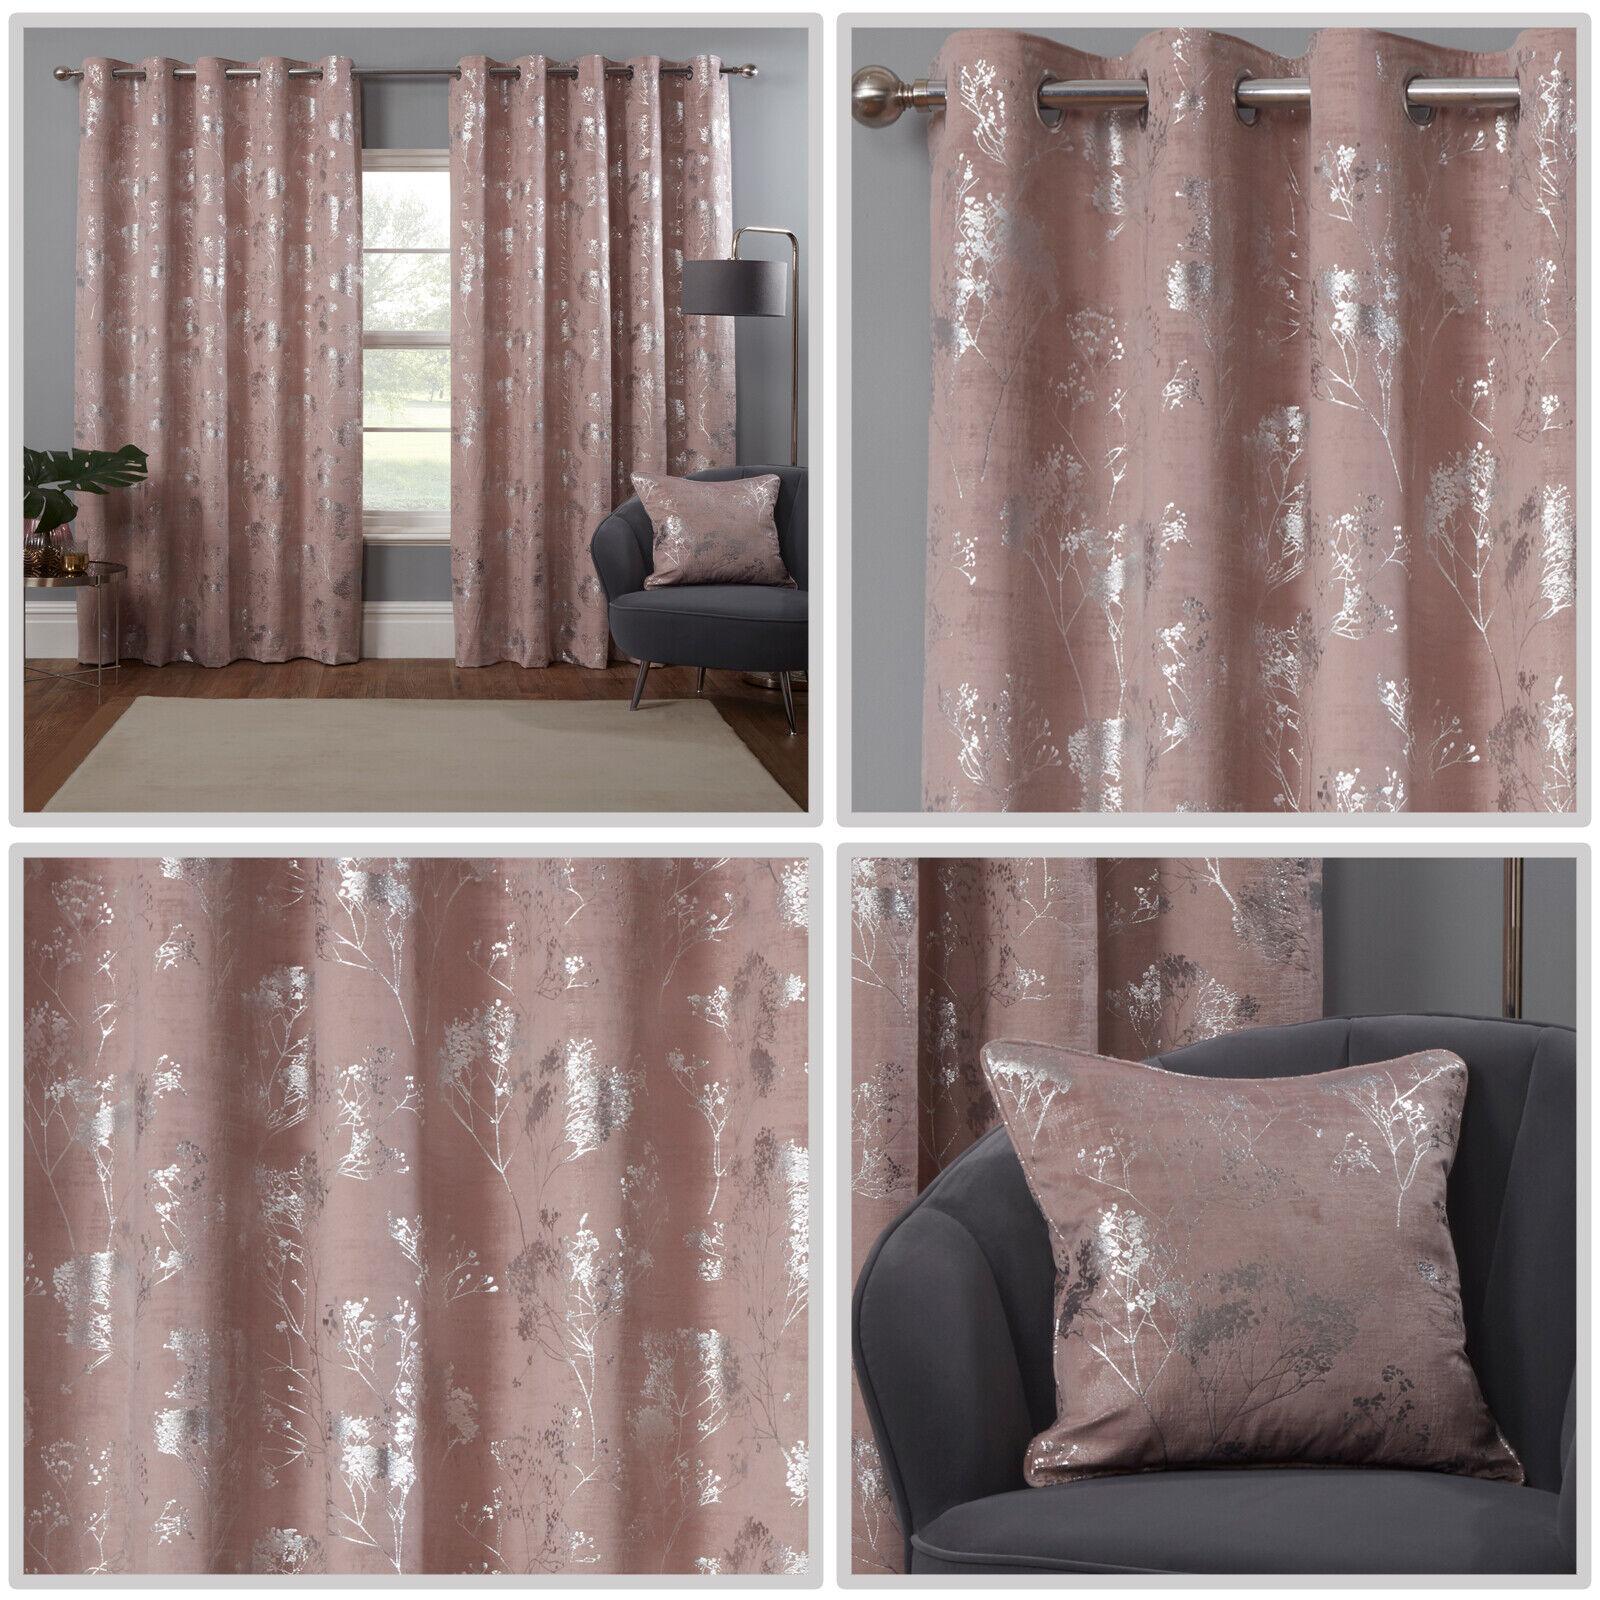 Blush Pink Eyelet Curtains Blossom Tree Silver Foil Velvet Ring Curtains Pair Ebay